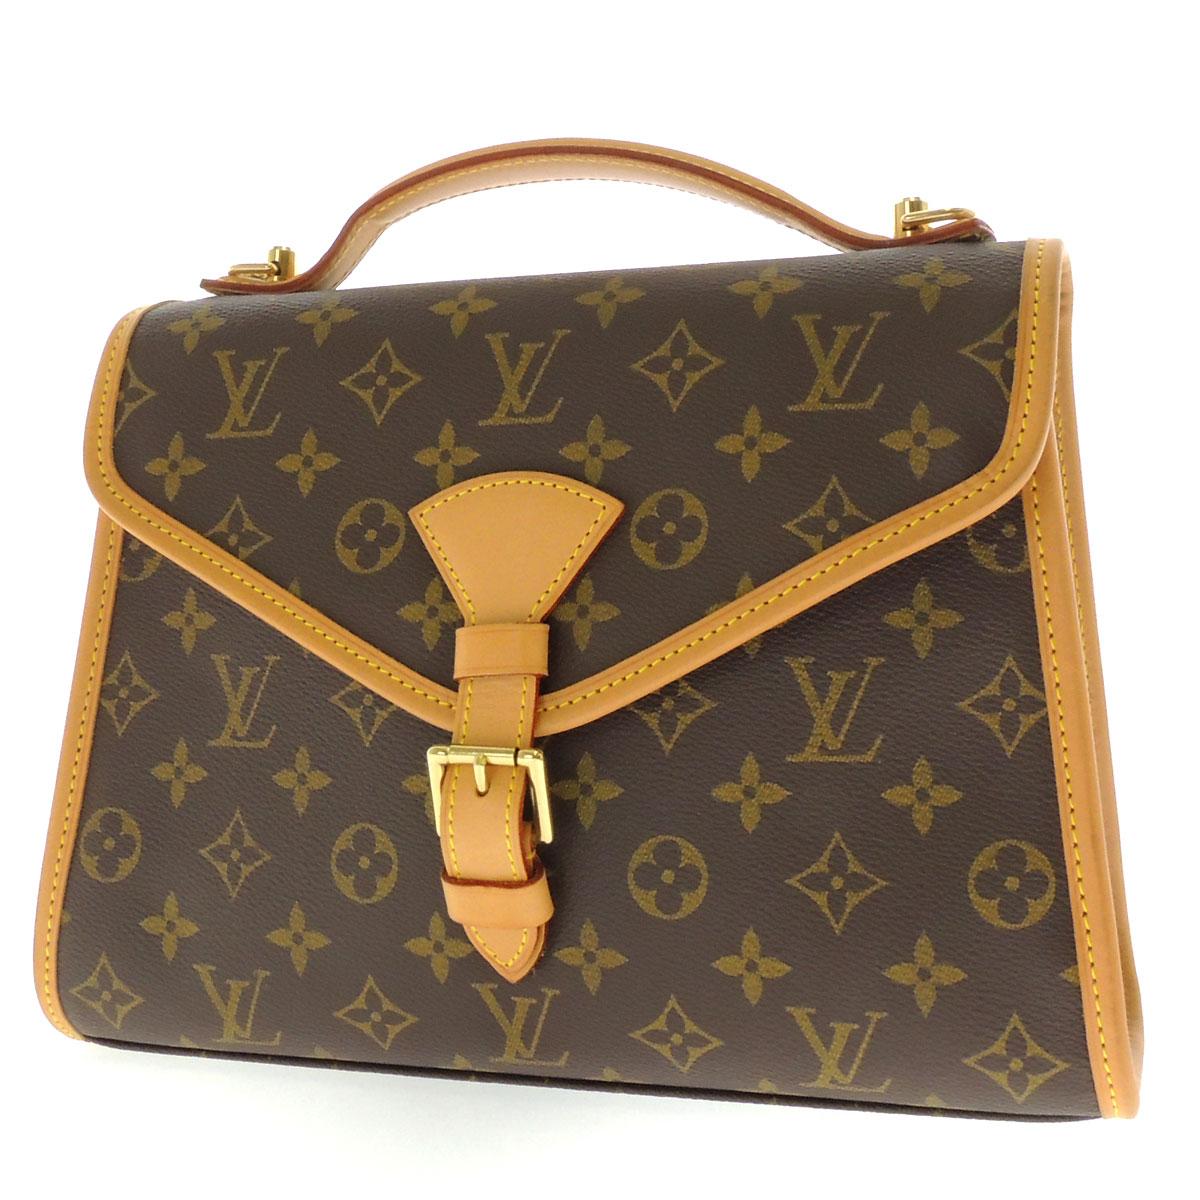 LOUIS VUITTON bell air shoulder M51122 shoulder bag monogram canvas Lady's belonging to